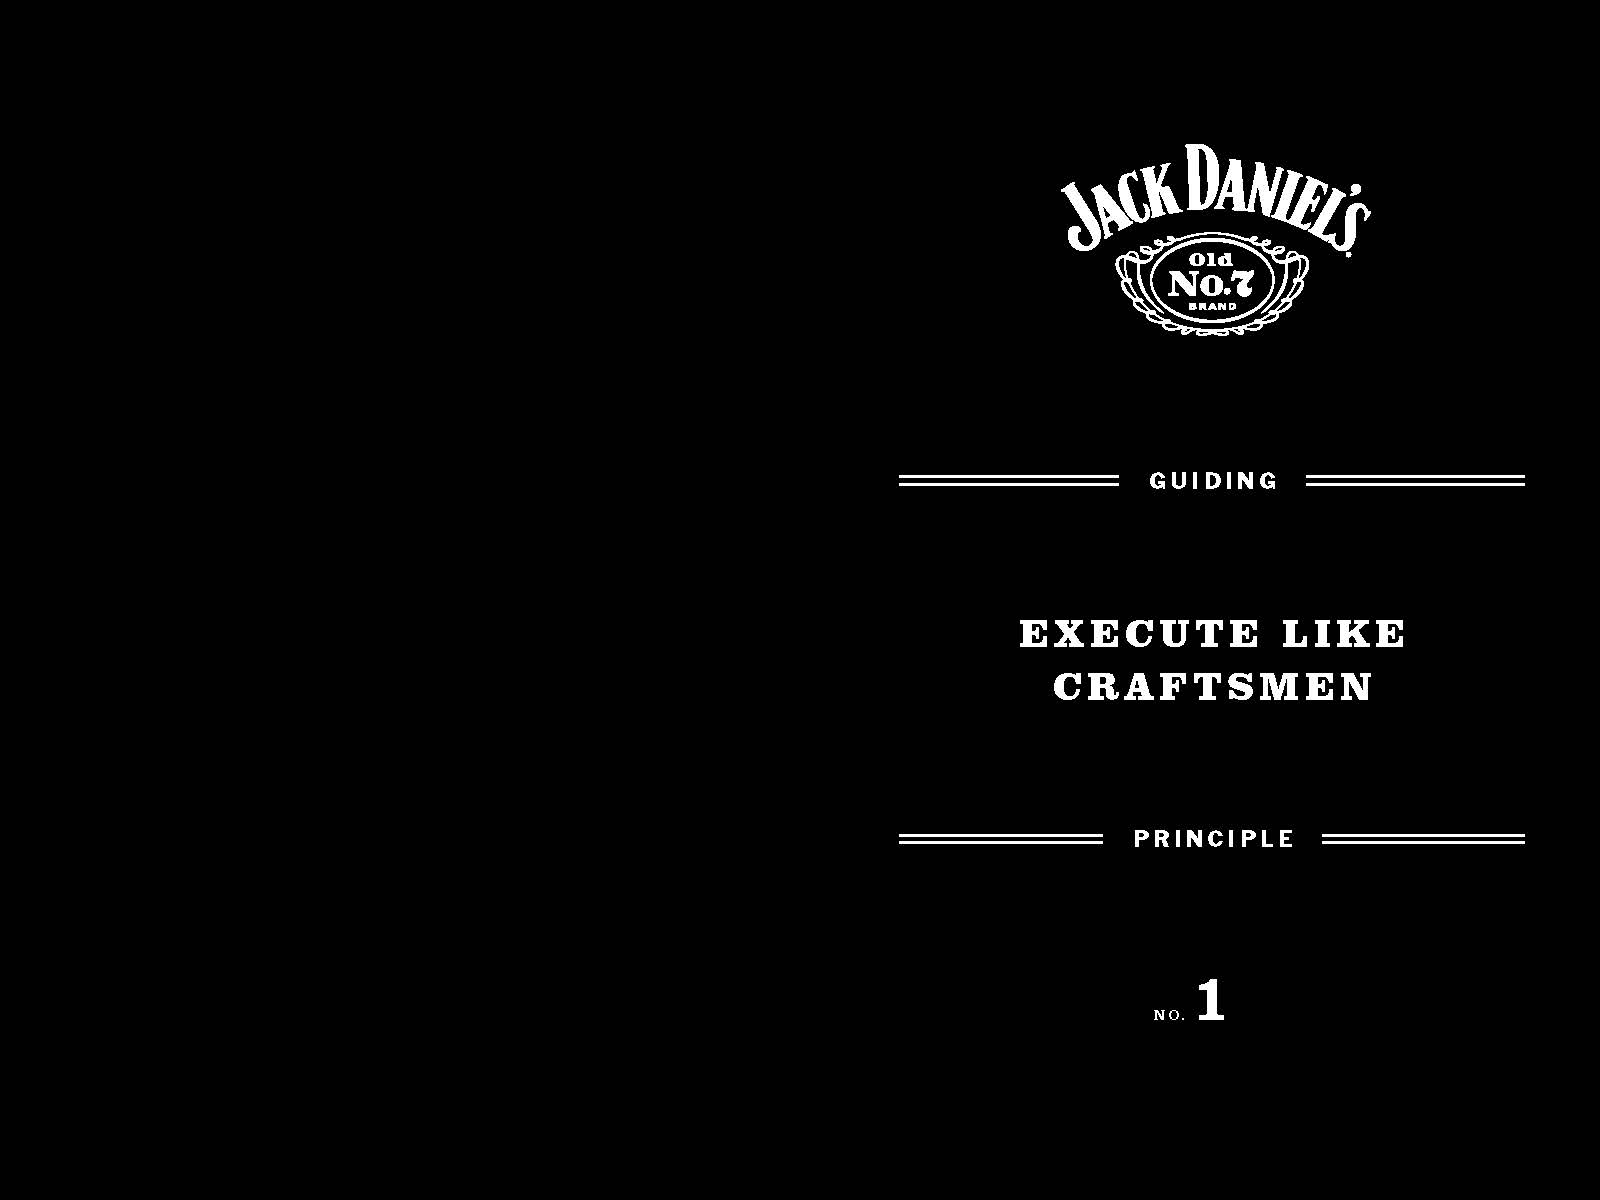 Jack Daniel's Guiding Principles 2012_Page_04.jpg